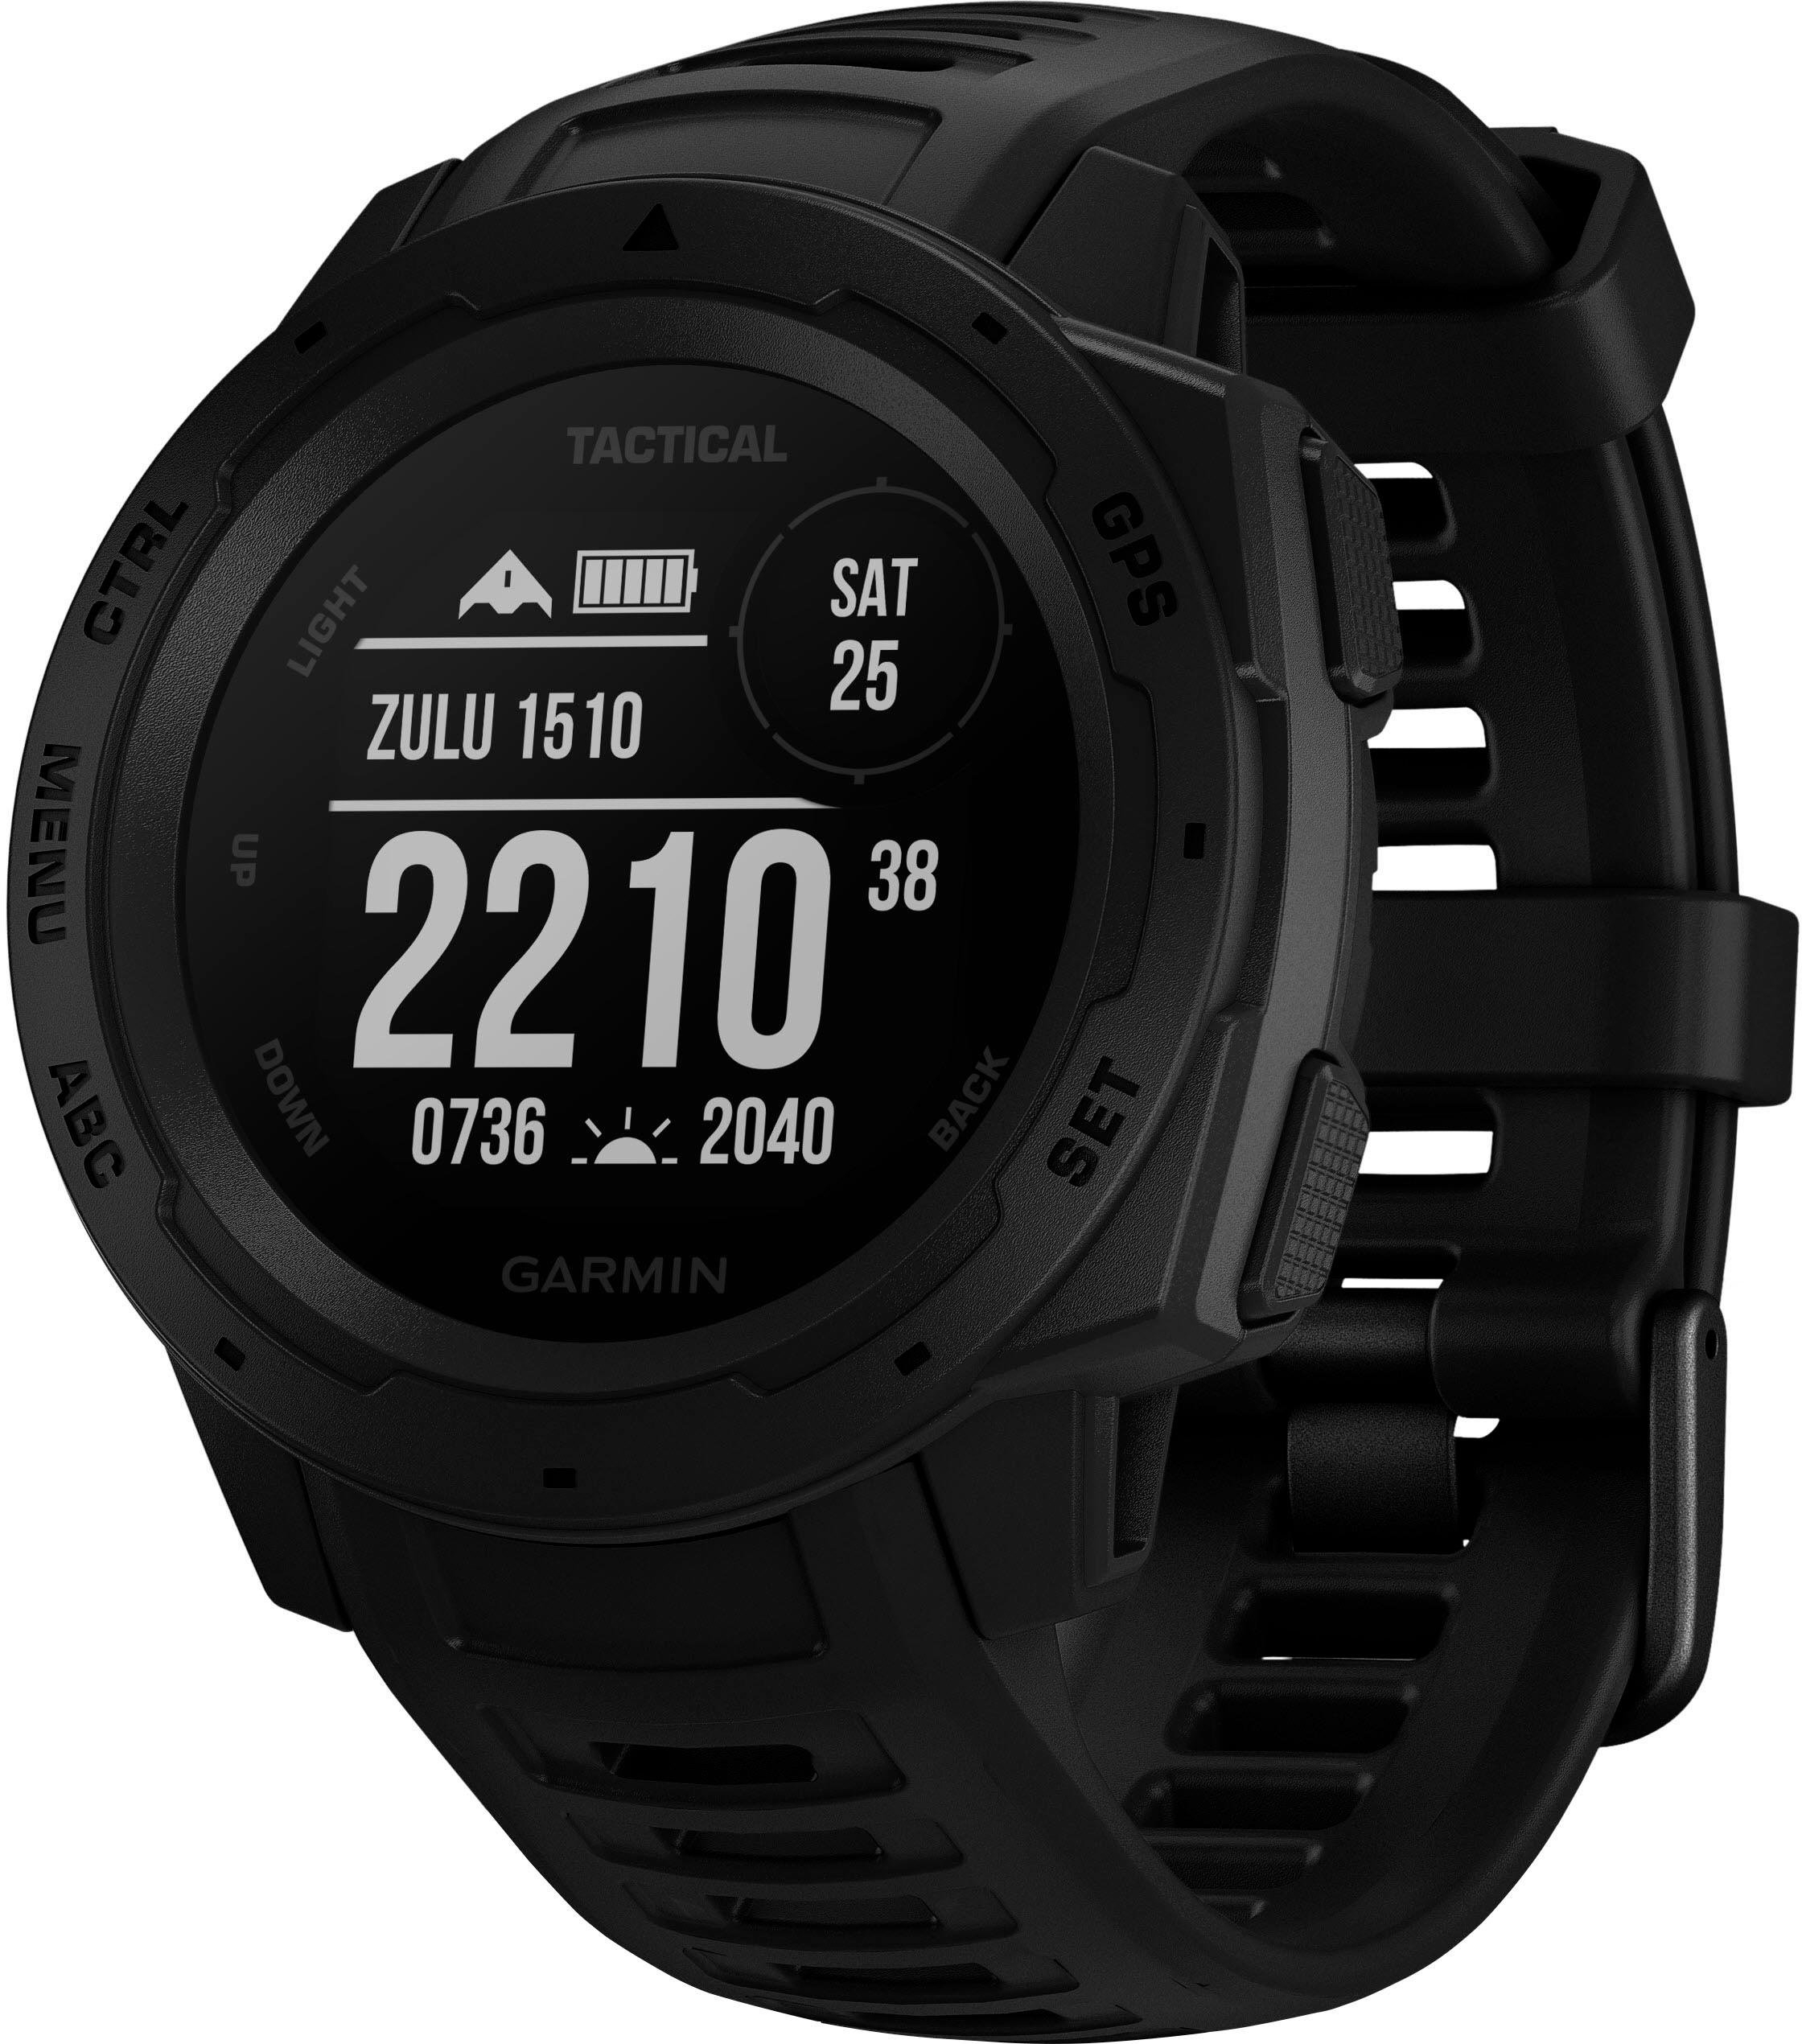 Garmin smartwatch Instinct Tactical - gratis ruilen op otto.nl